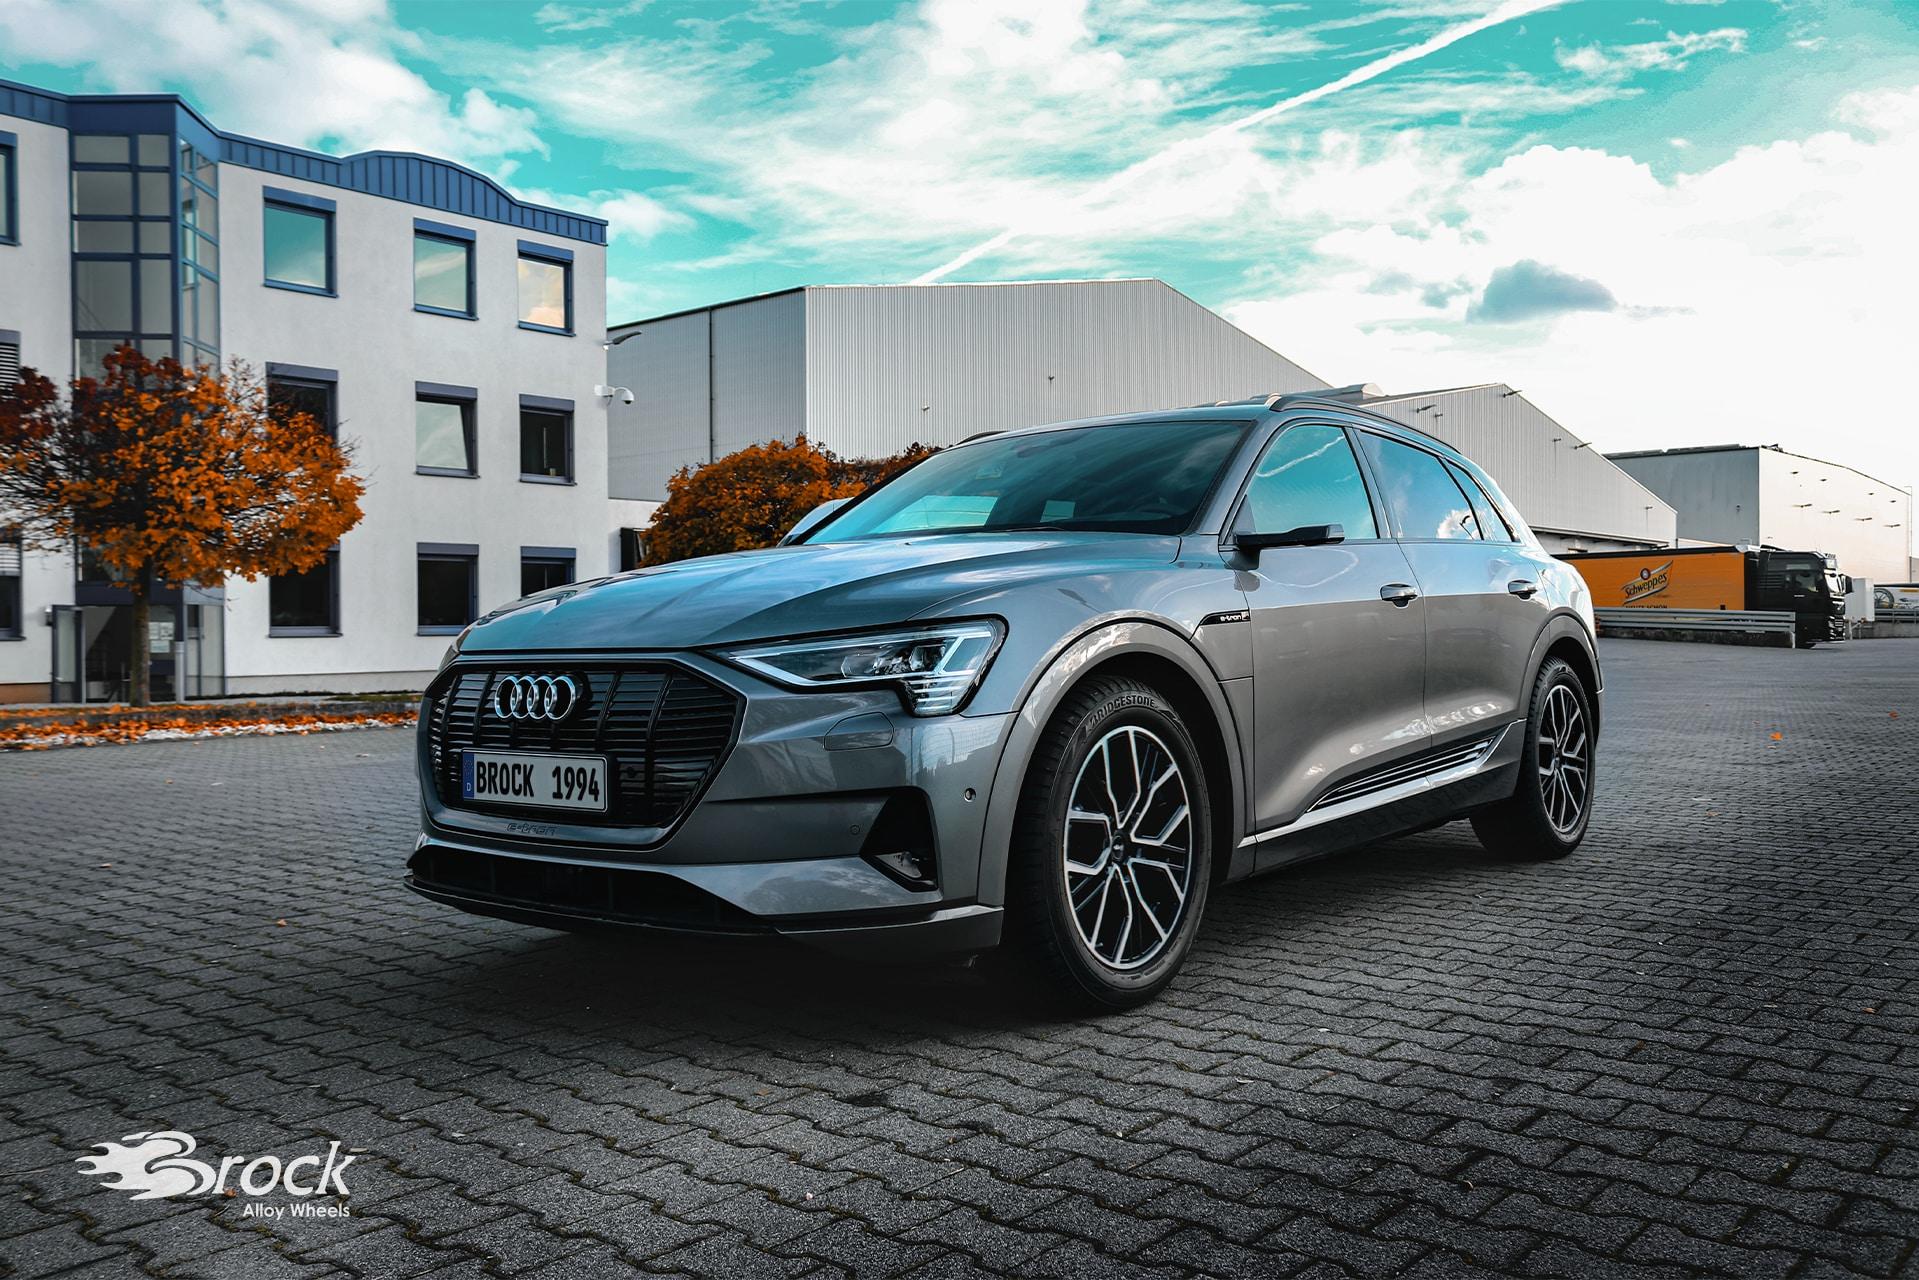 20 Zoll ECE Alufelgen Brock B41 für den Audi e-tron (GE)